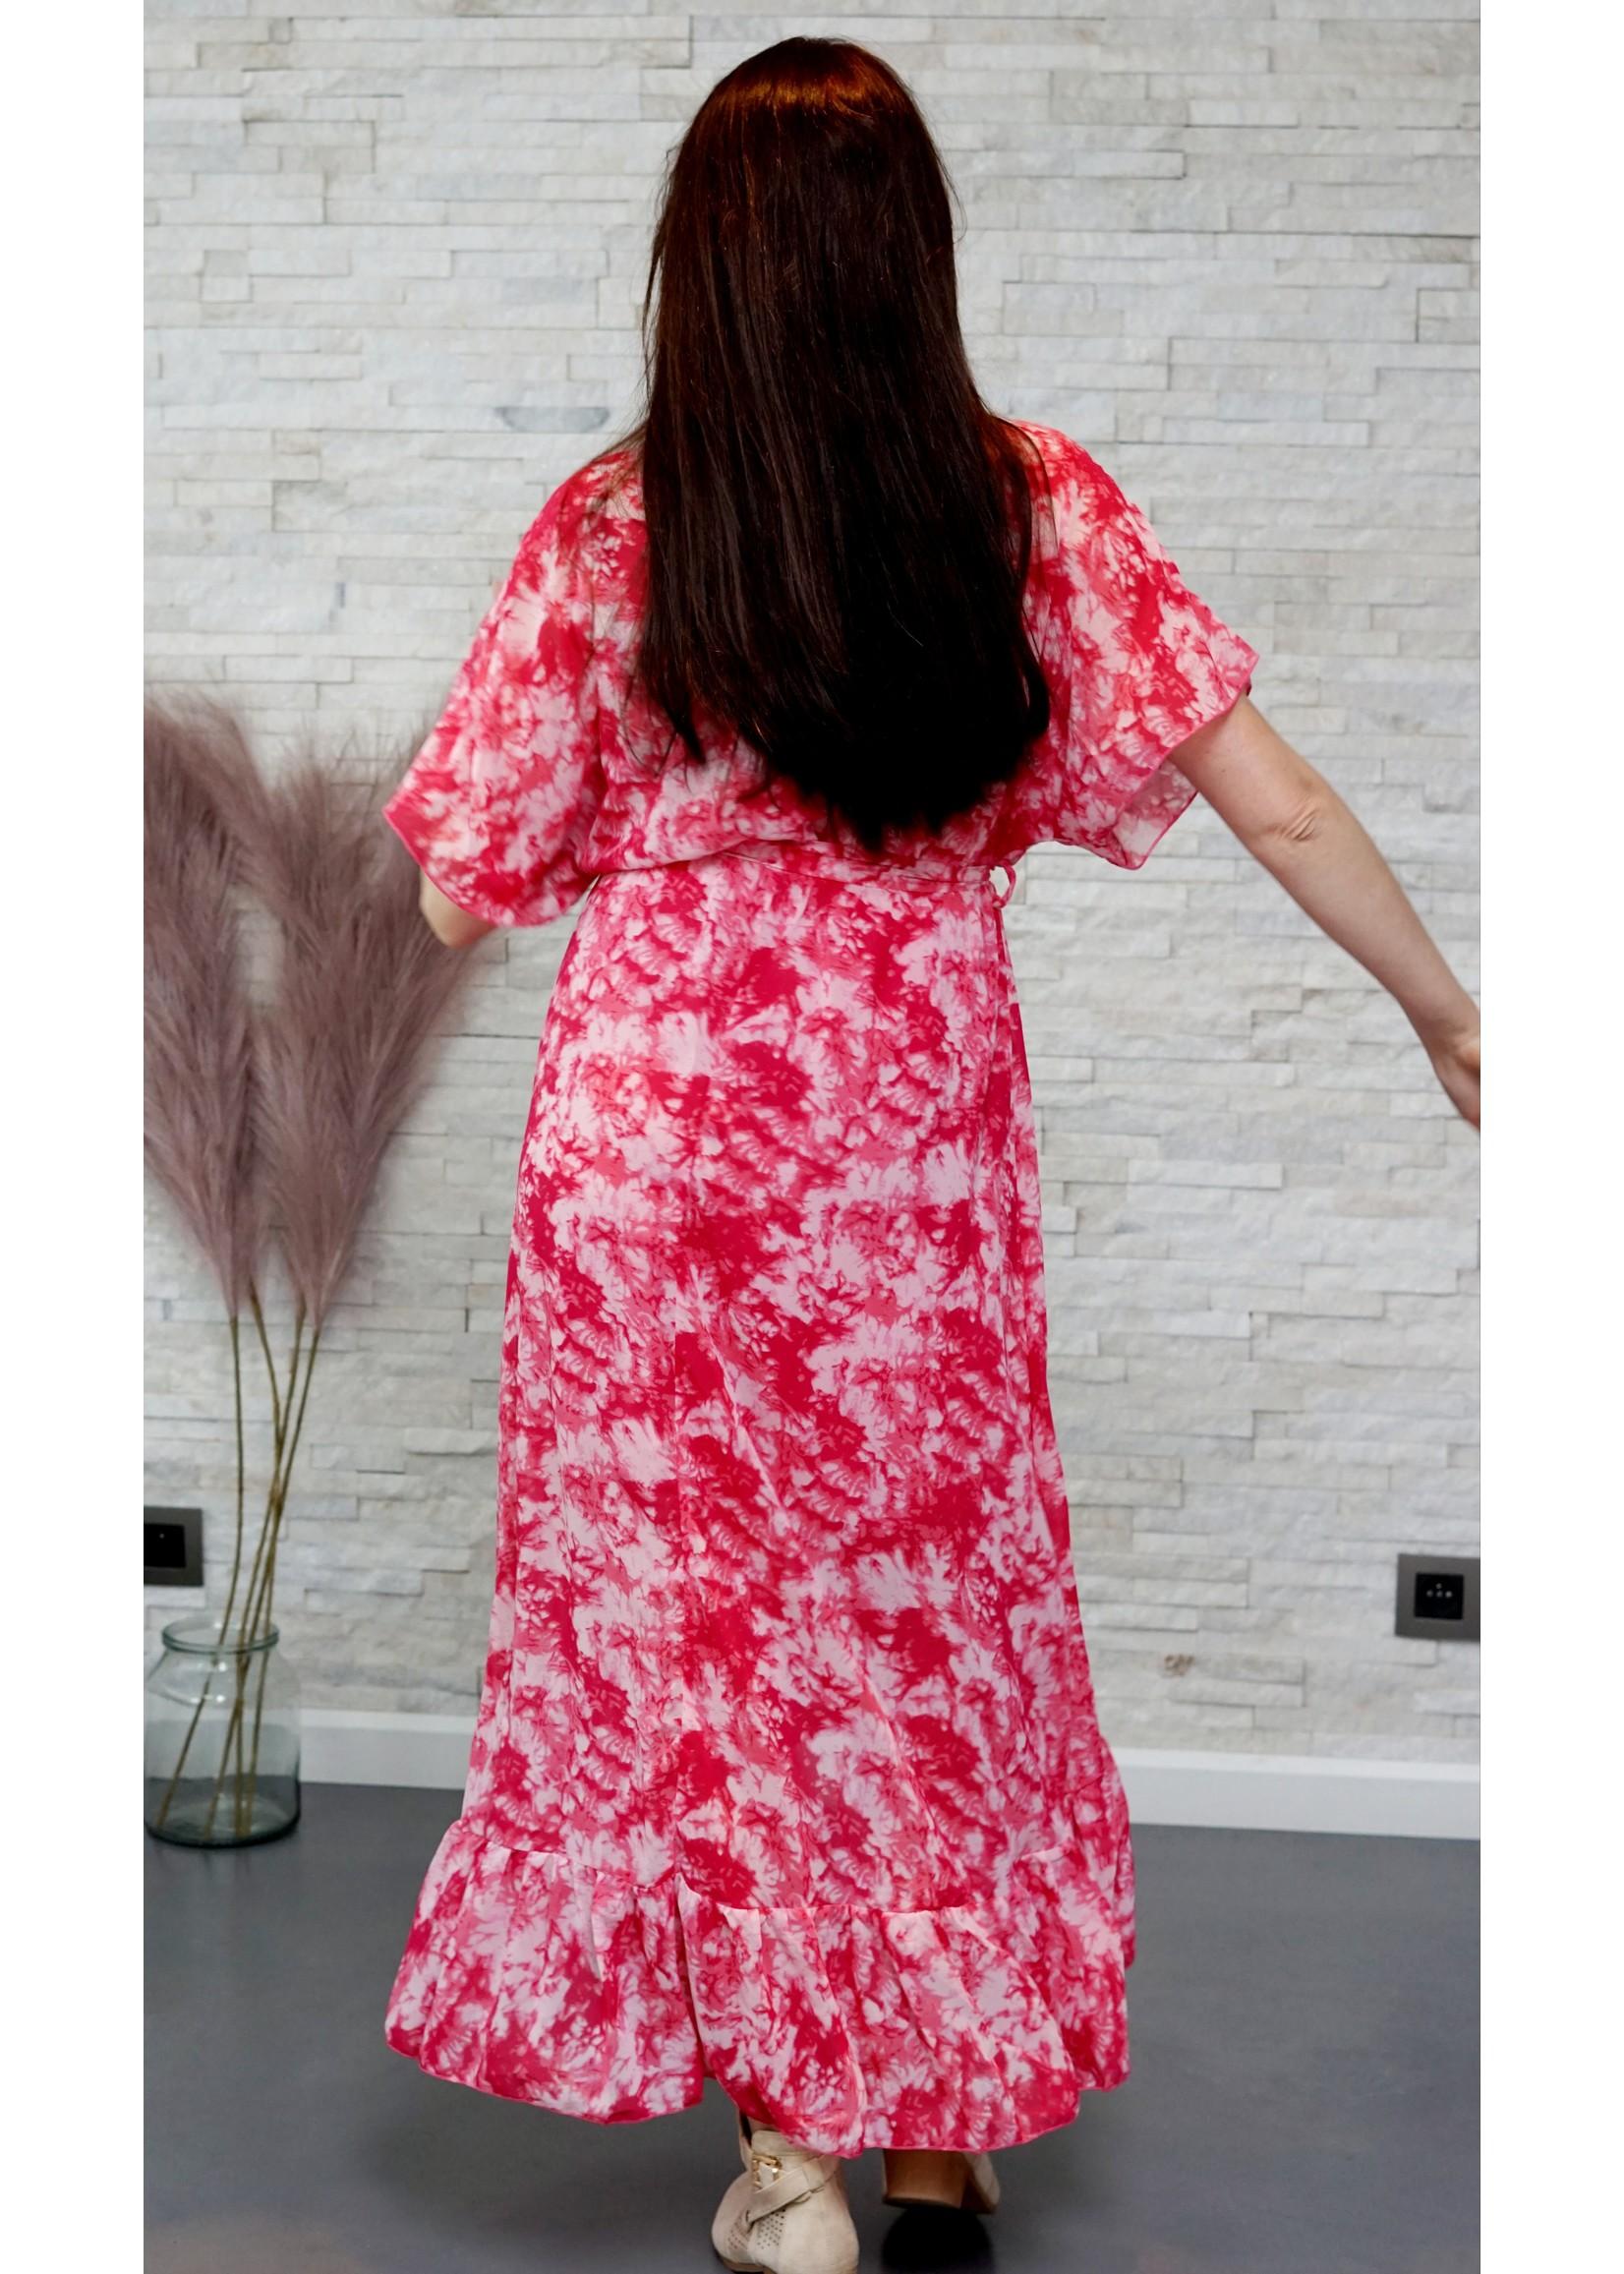 Cherry Paris Officiel Cherry pink tie dye dress